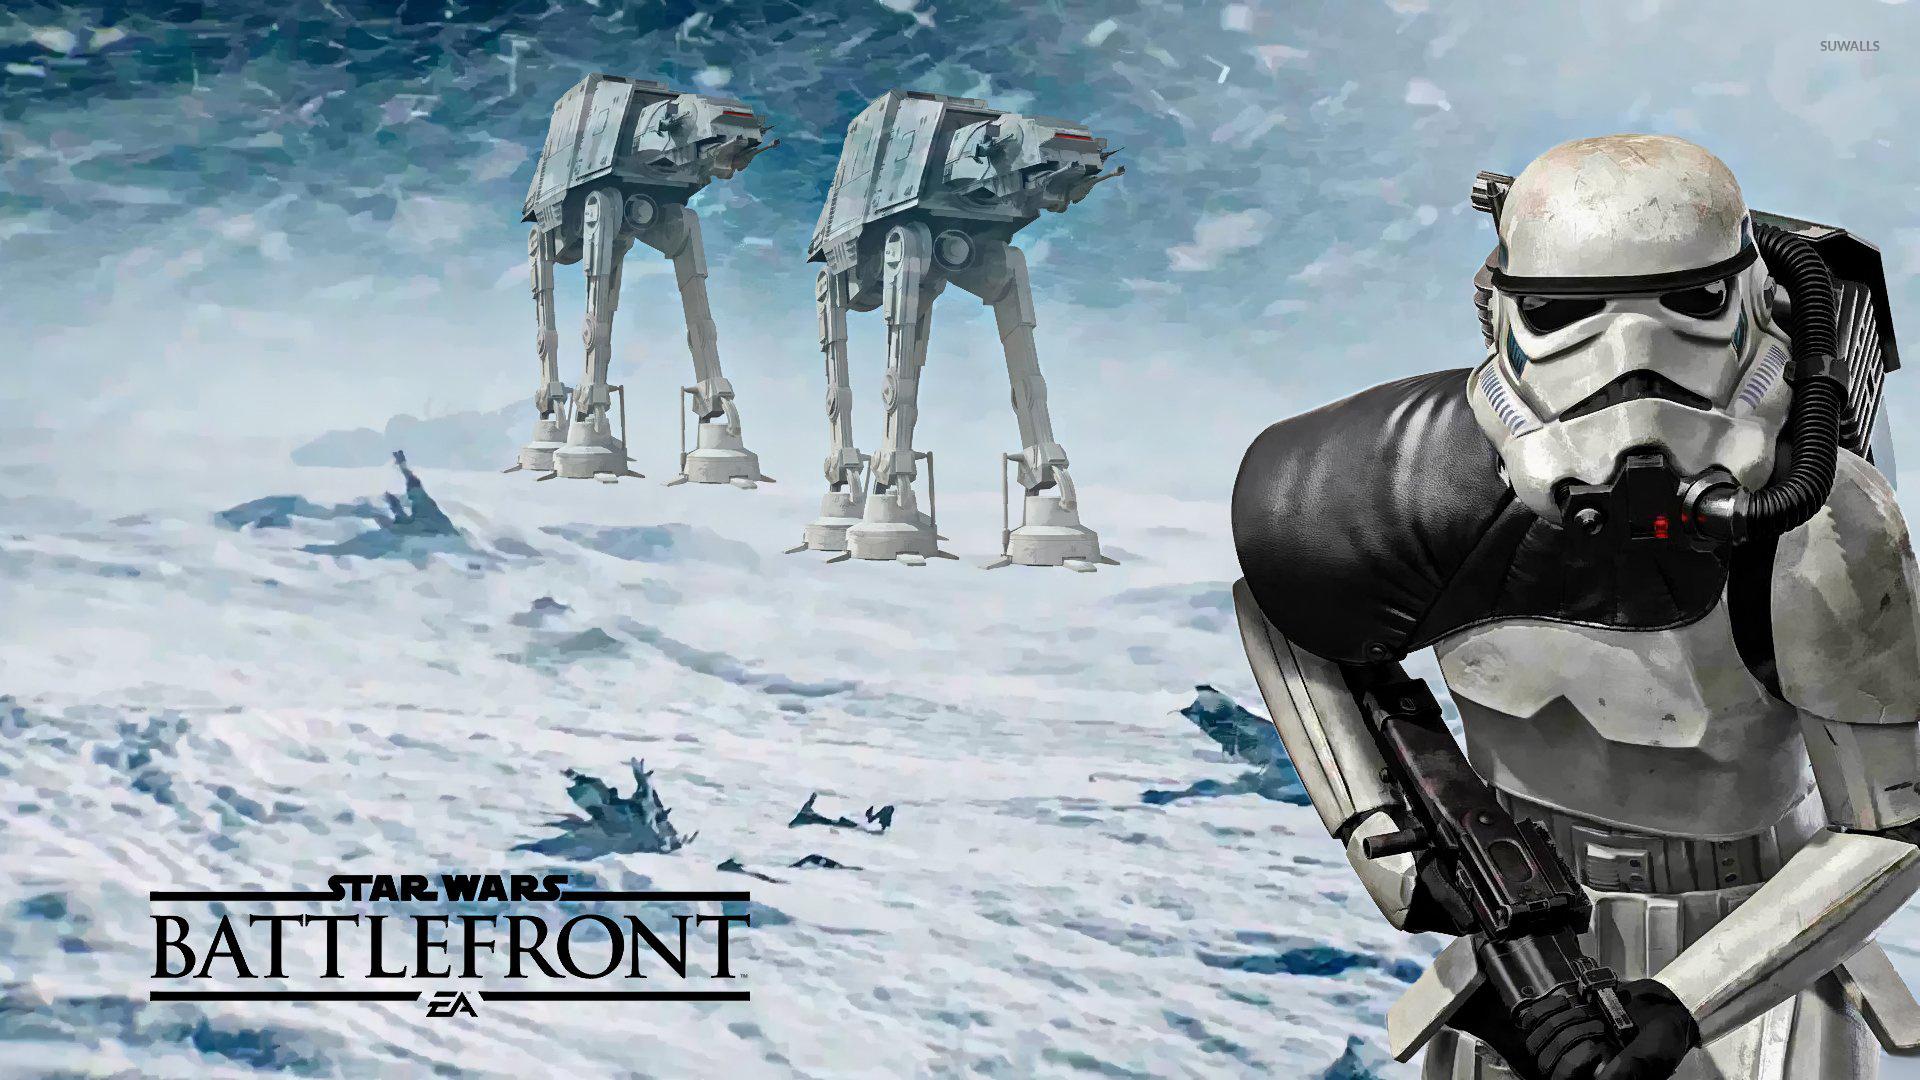 Star Wars Battlefront Stormtrooper Desktop Wallpapers 1280x720 Download Hd Wallpaper Wallpapertip